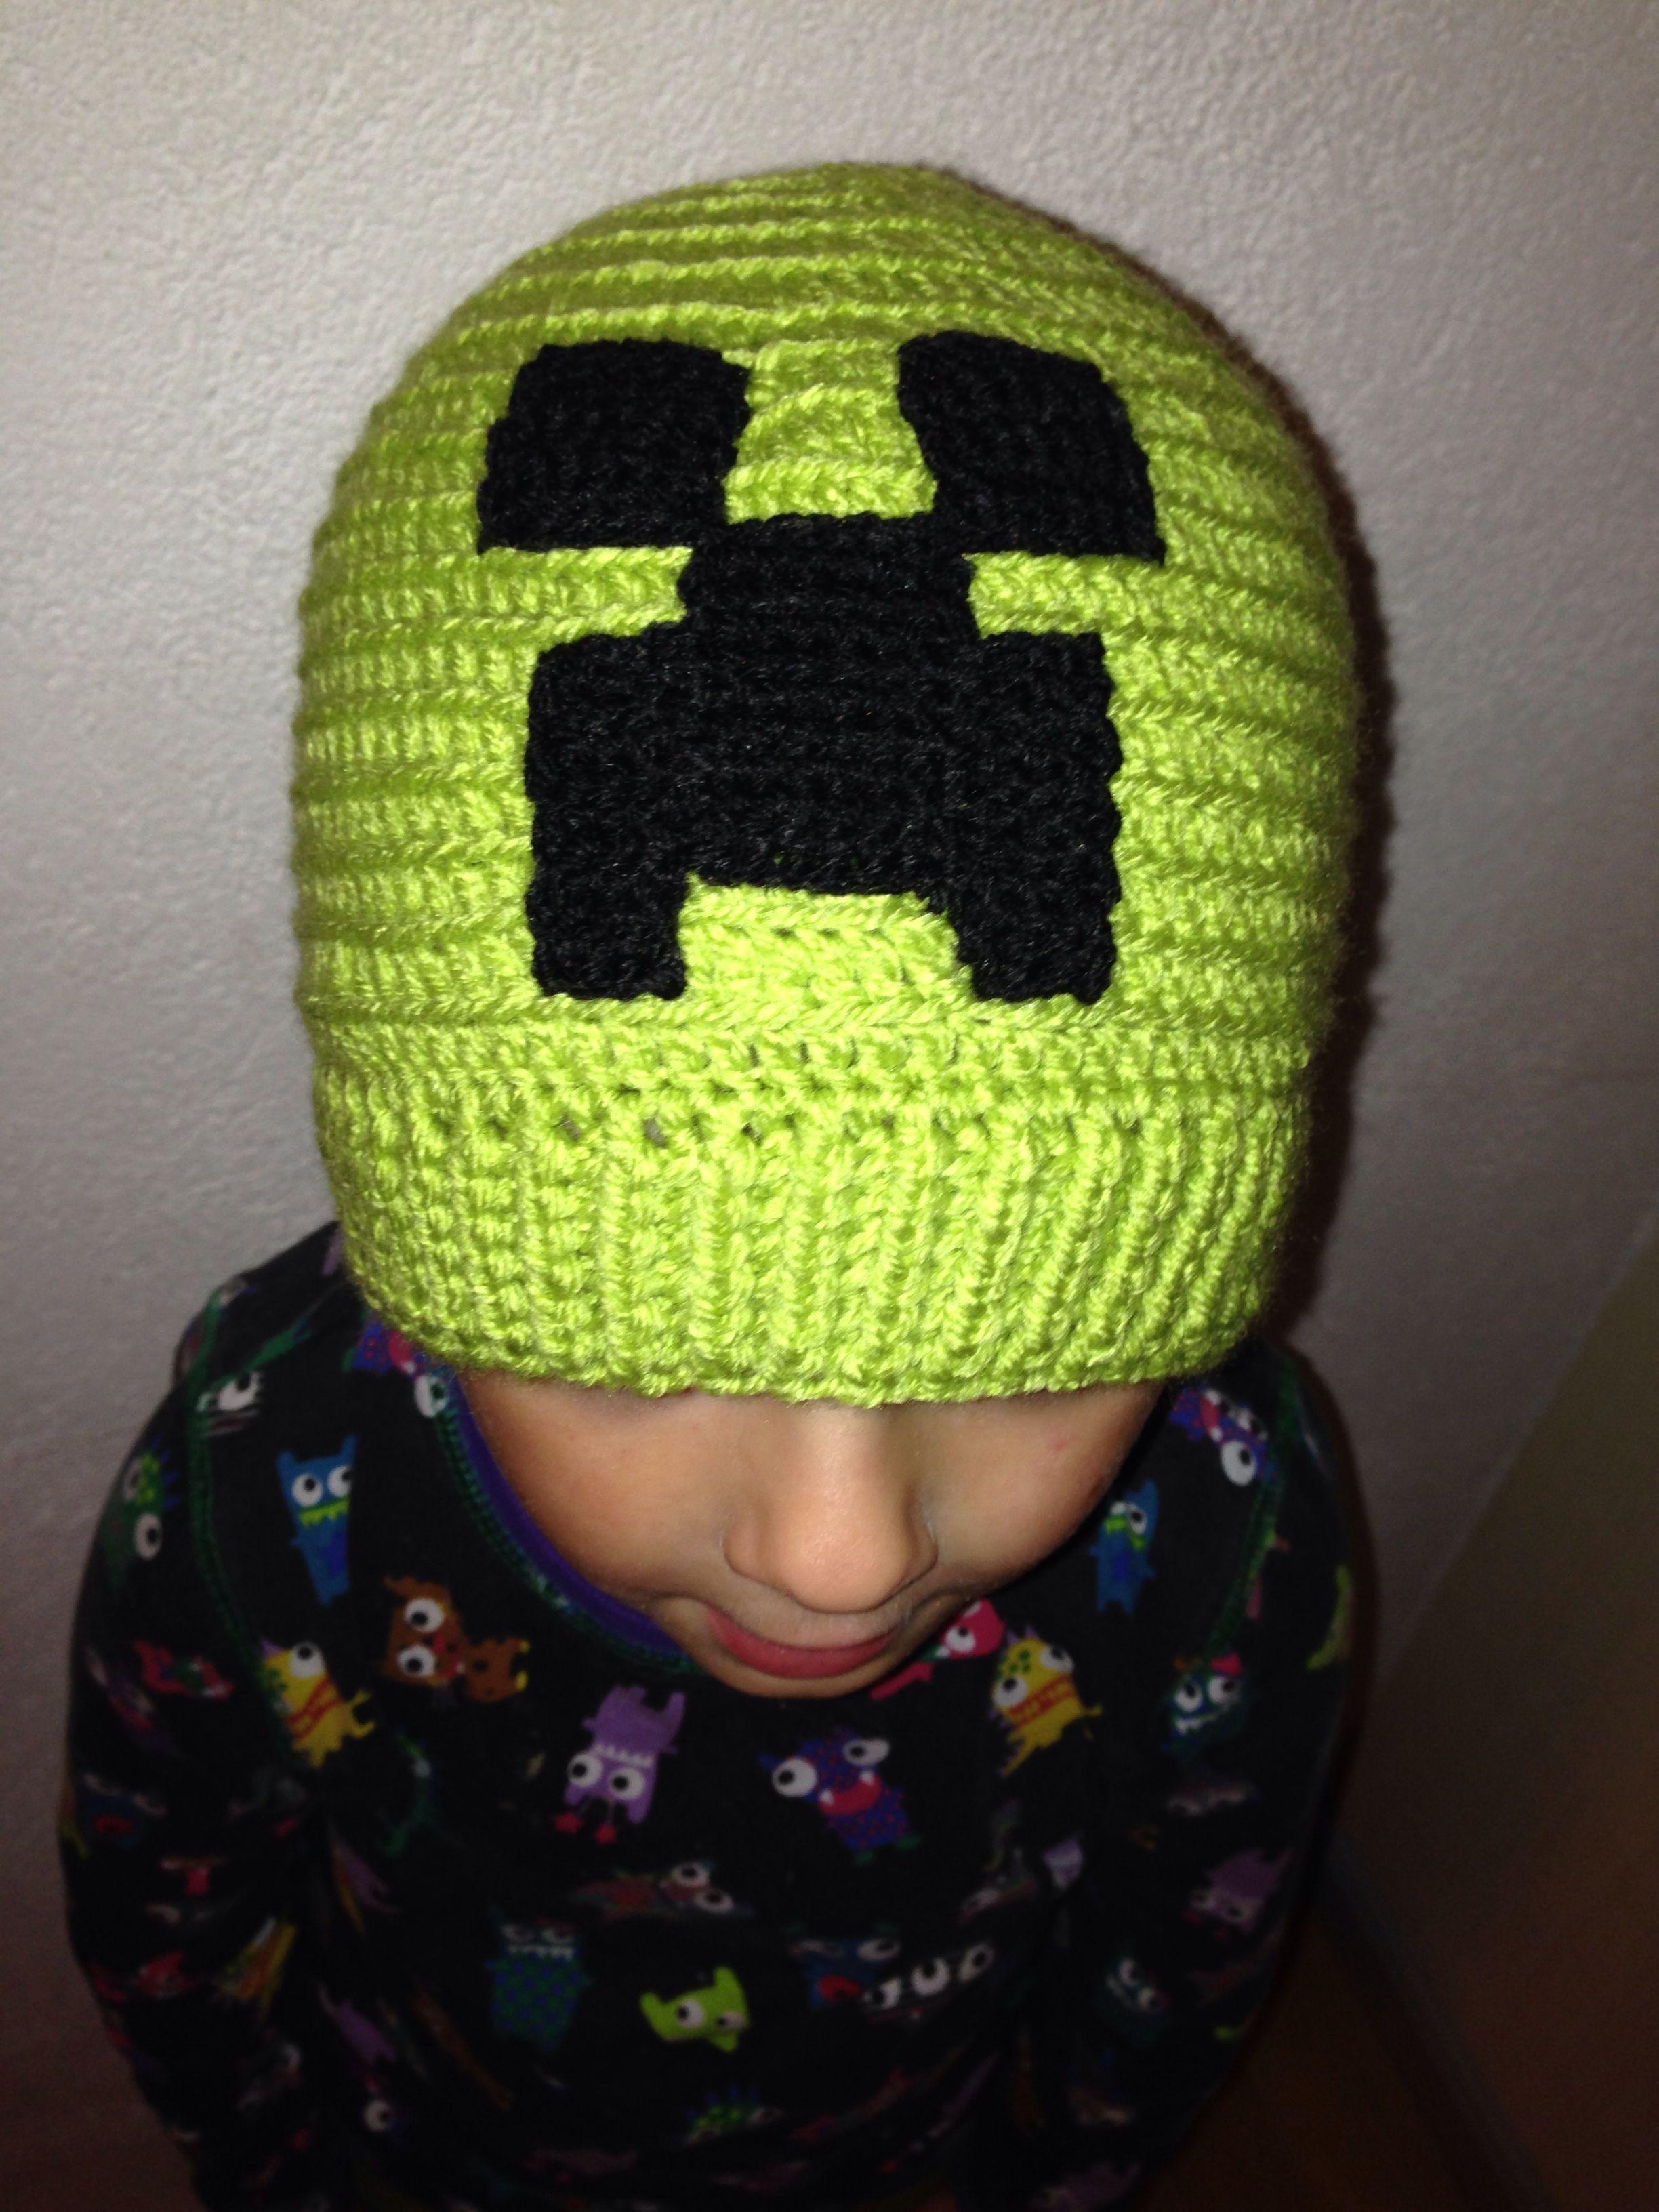 2fb381318bc Crochet beanie with a Minecraft creeper applique.